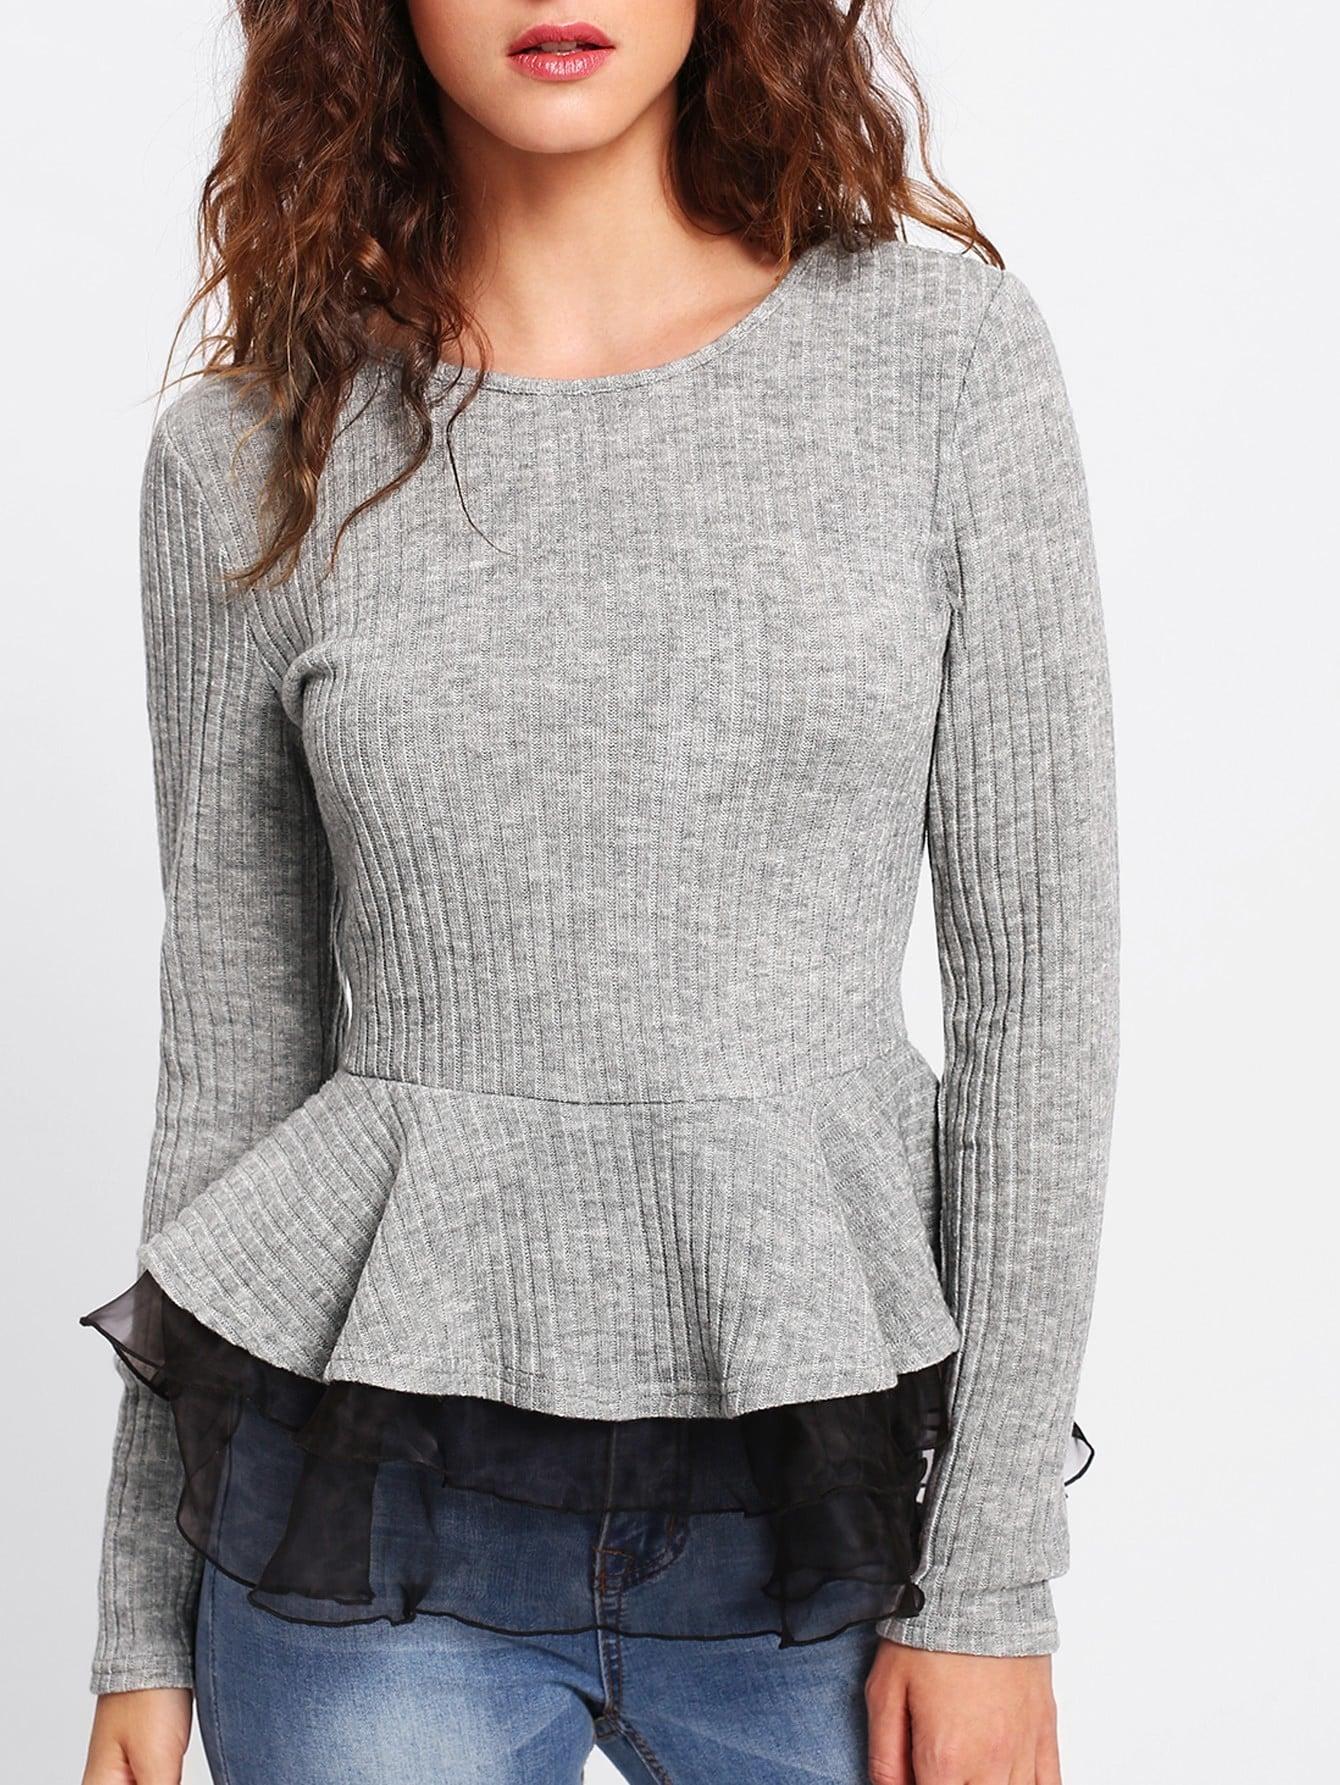 Contrast Mesh Trim Rib Knit Peplum Top ruffle shoulder rib knit peplum top